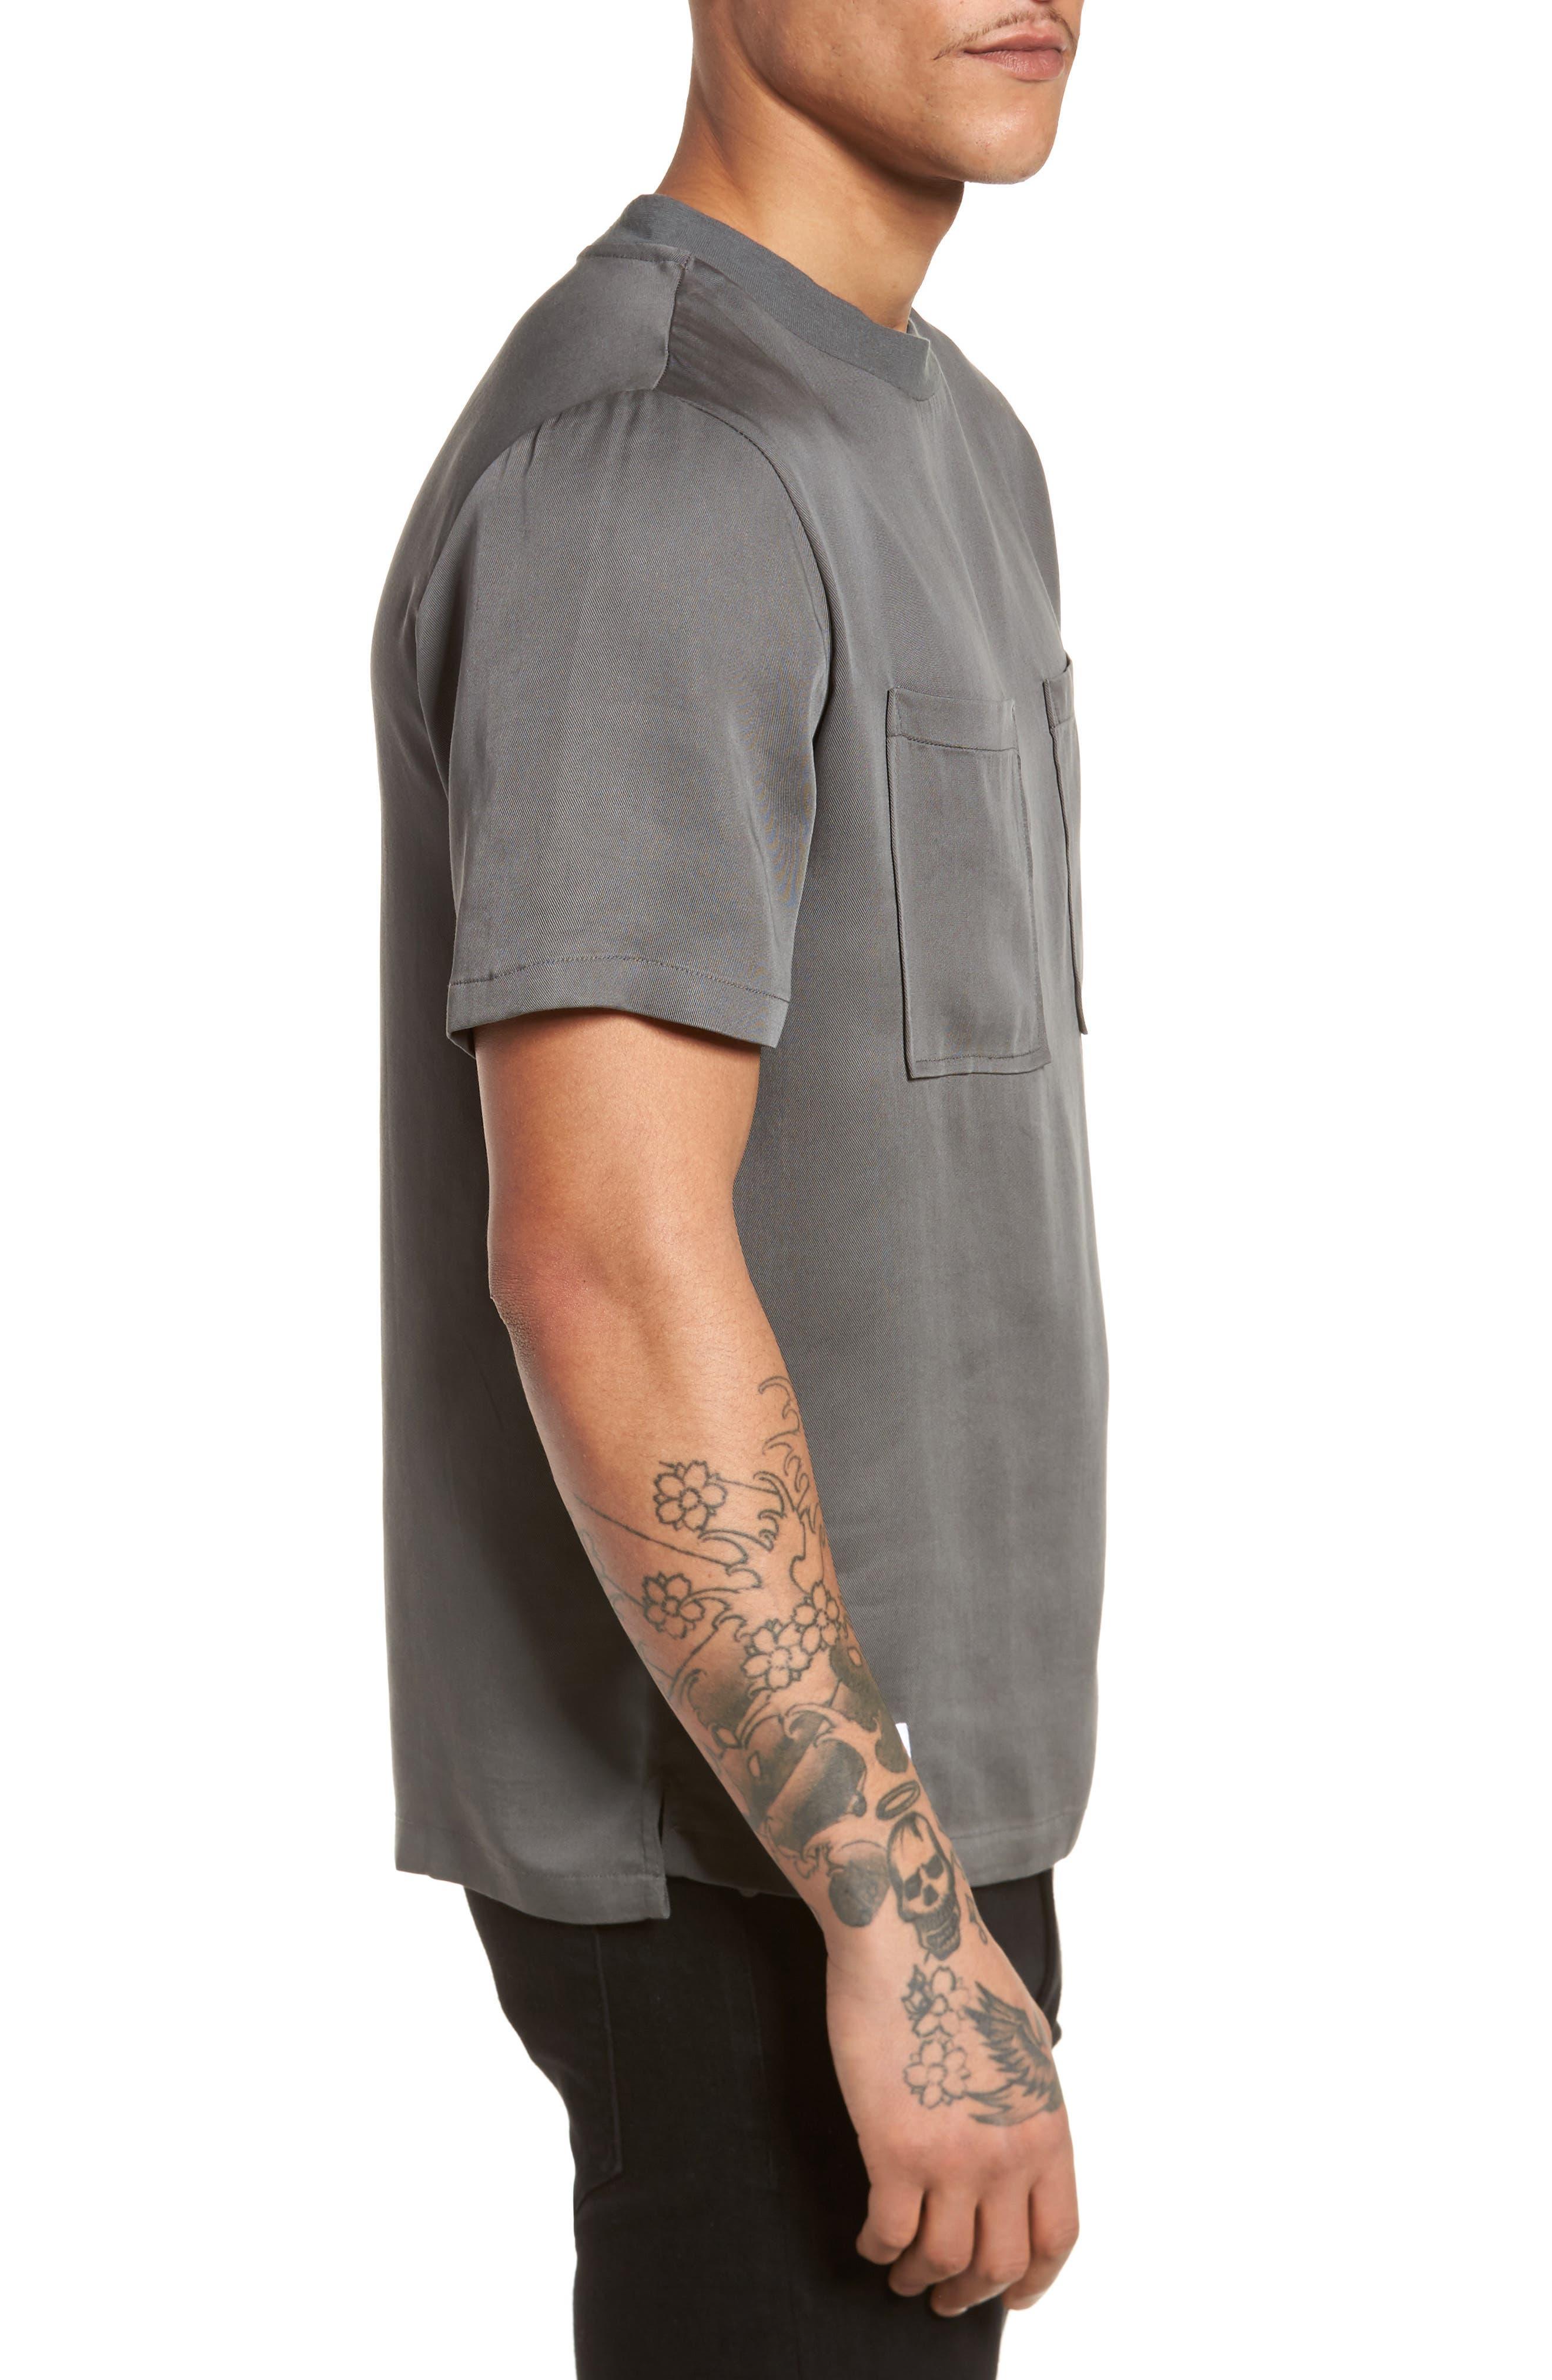 Denali Woven T-Shirt,                             Alternate thumbnail 3, color,                             Grey